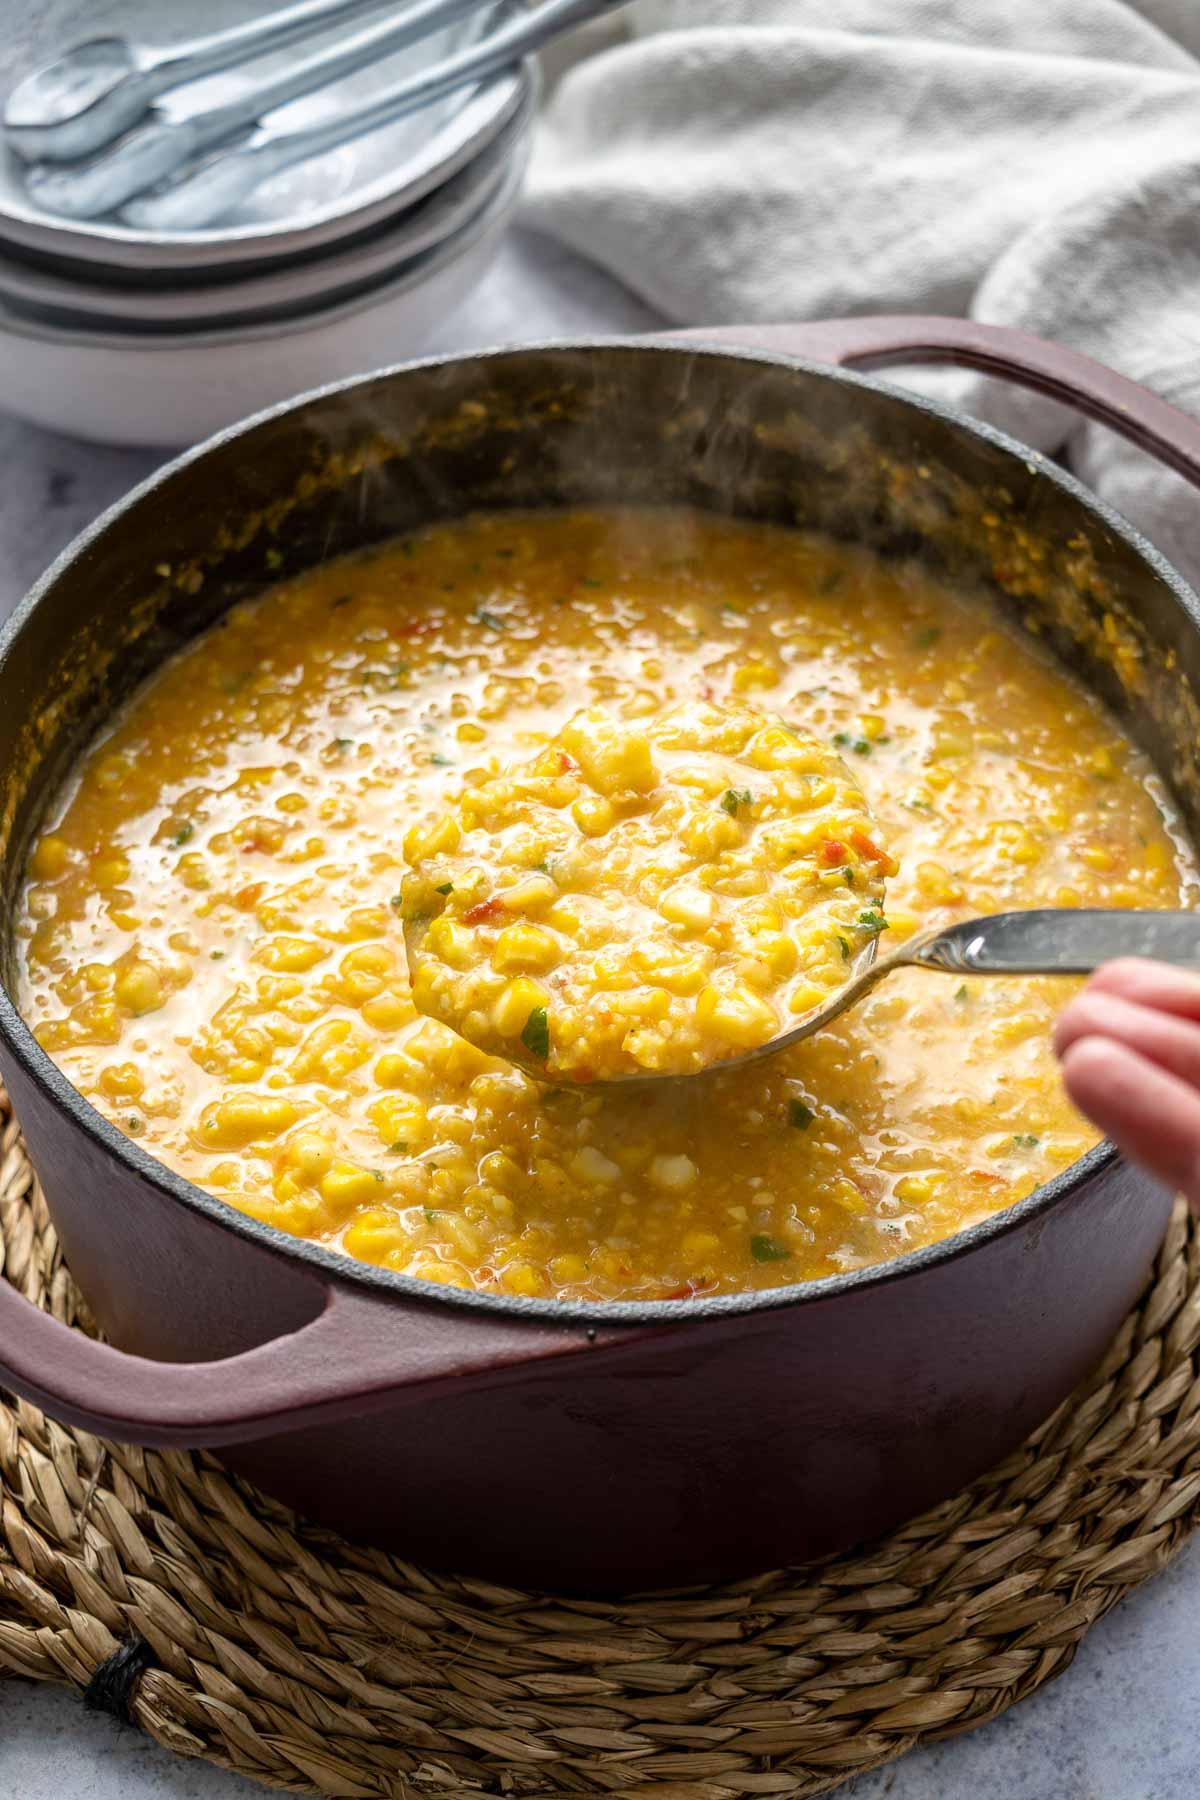 Topf mit Mais-Suppe